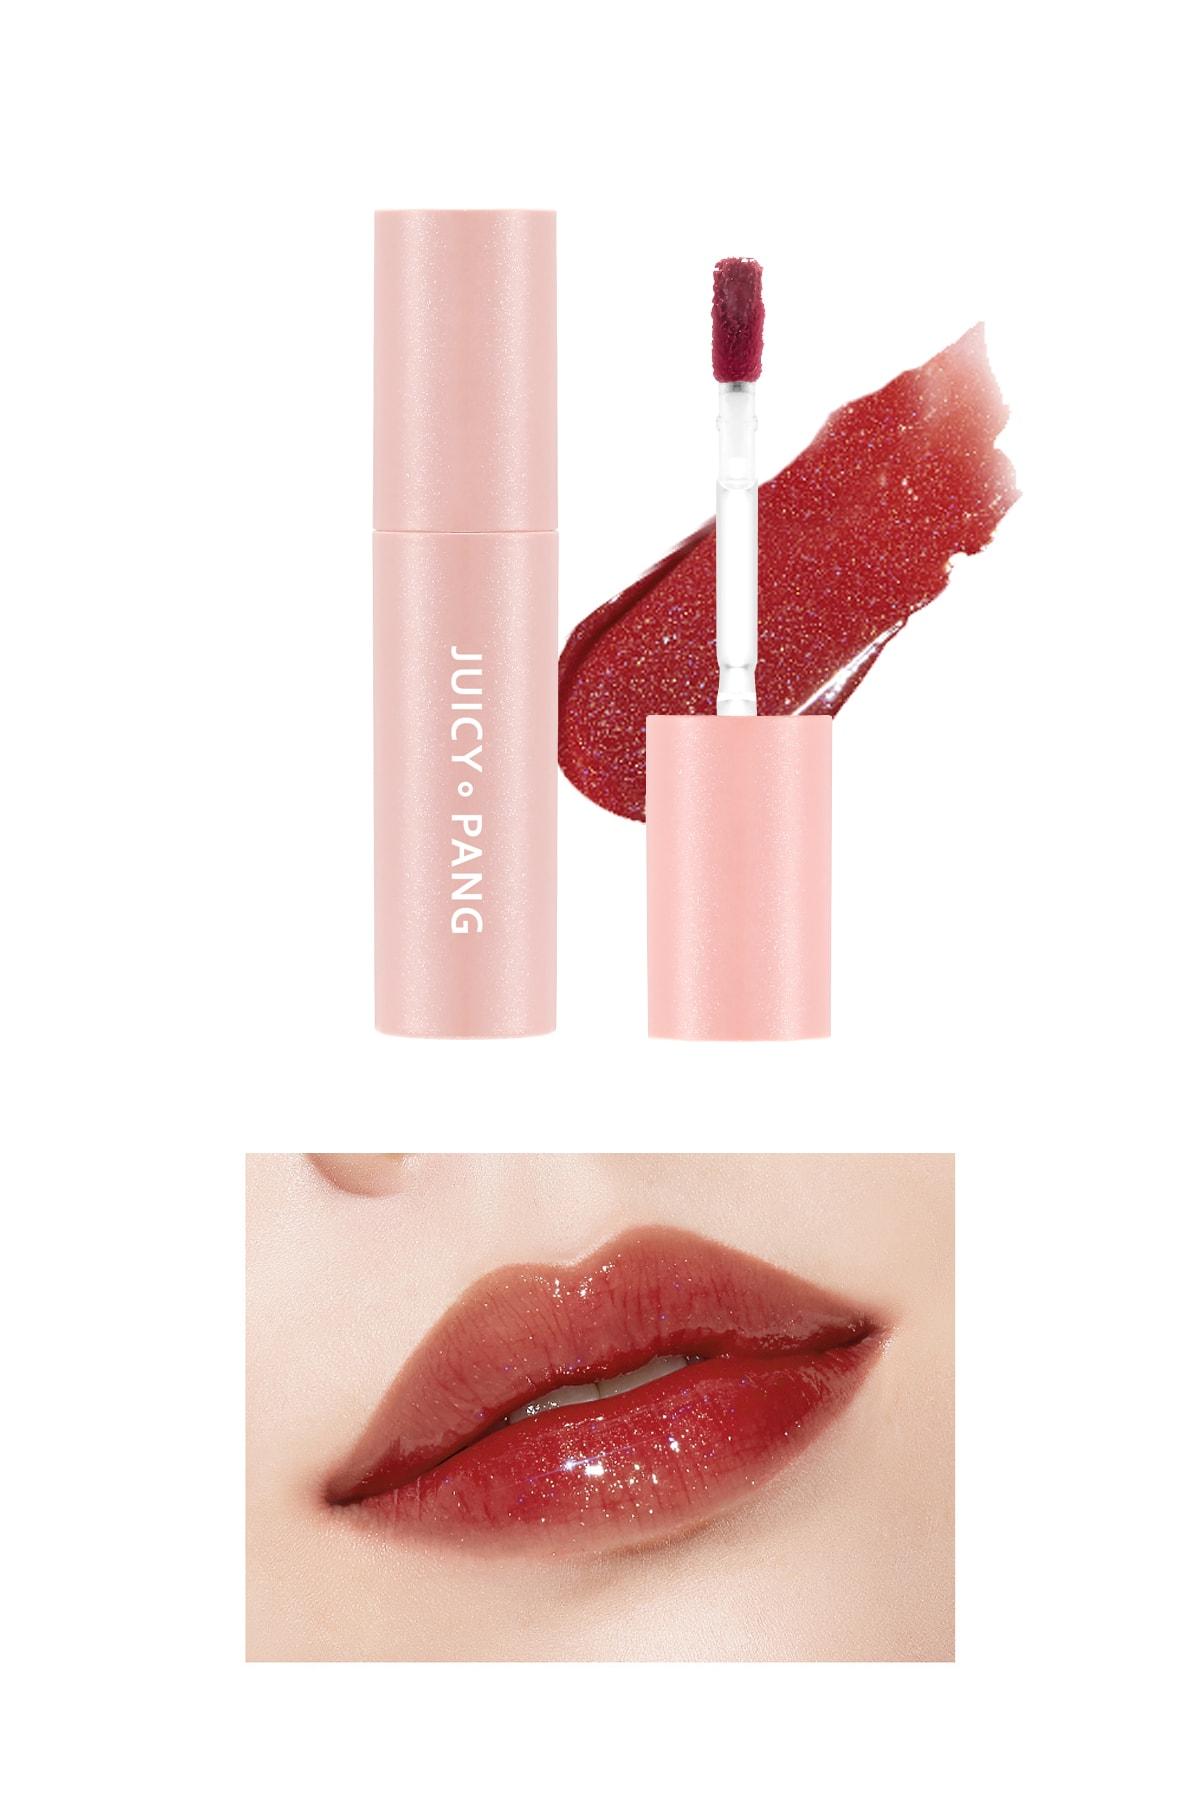 Missha Işıltı&Dolgunluk Veren Parlak Gloss Tint APIEU Juicy-Pang Sparkling Tint RD01 0